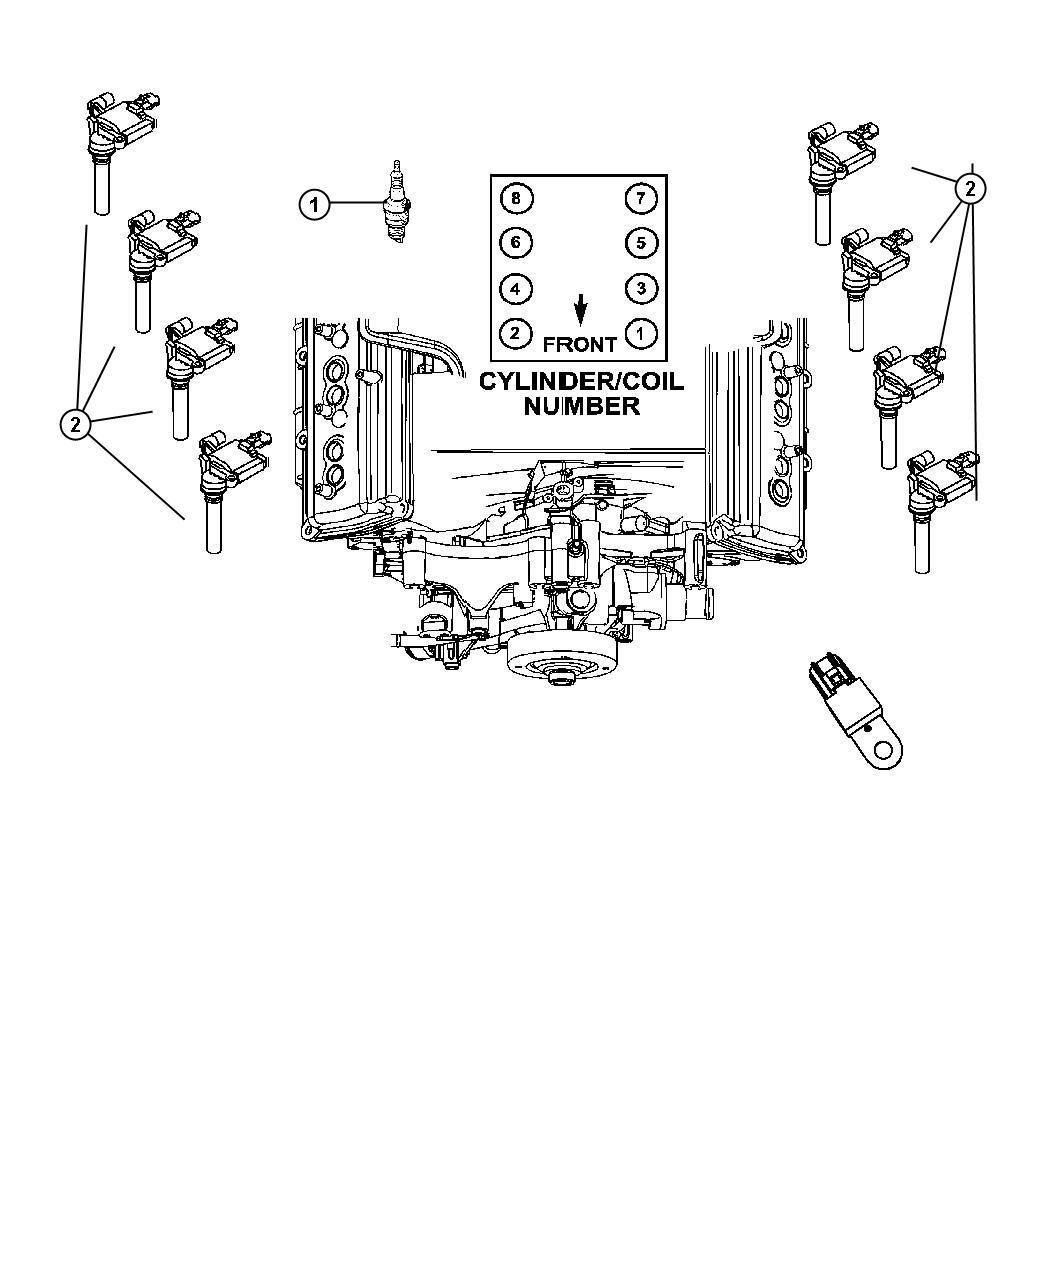 Chrysler Spark Plug Wires